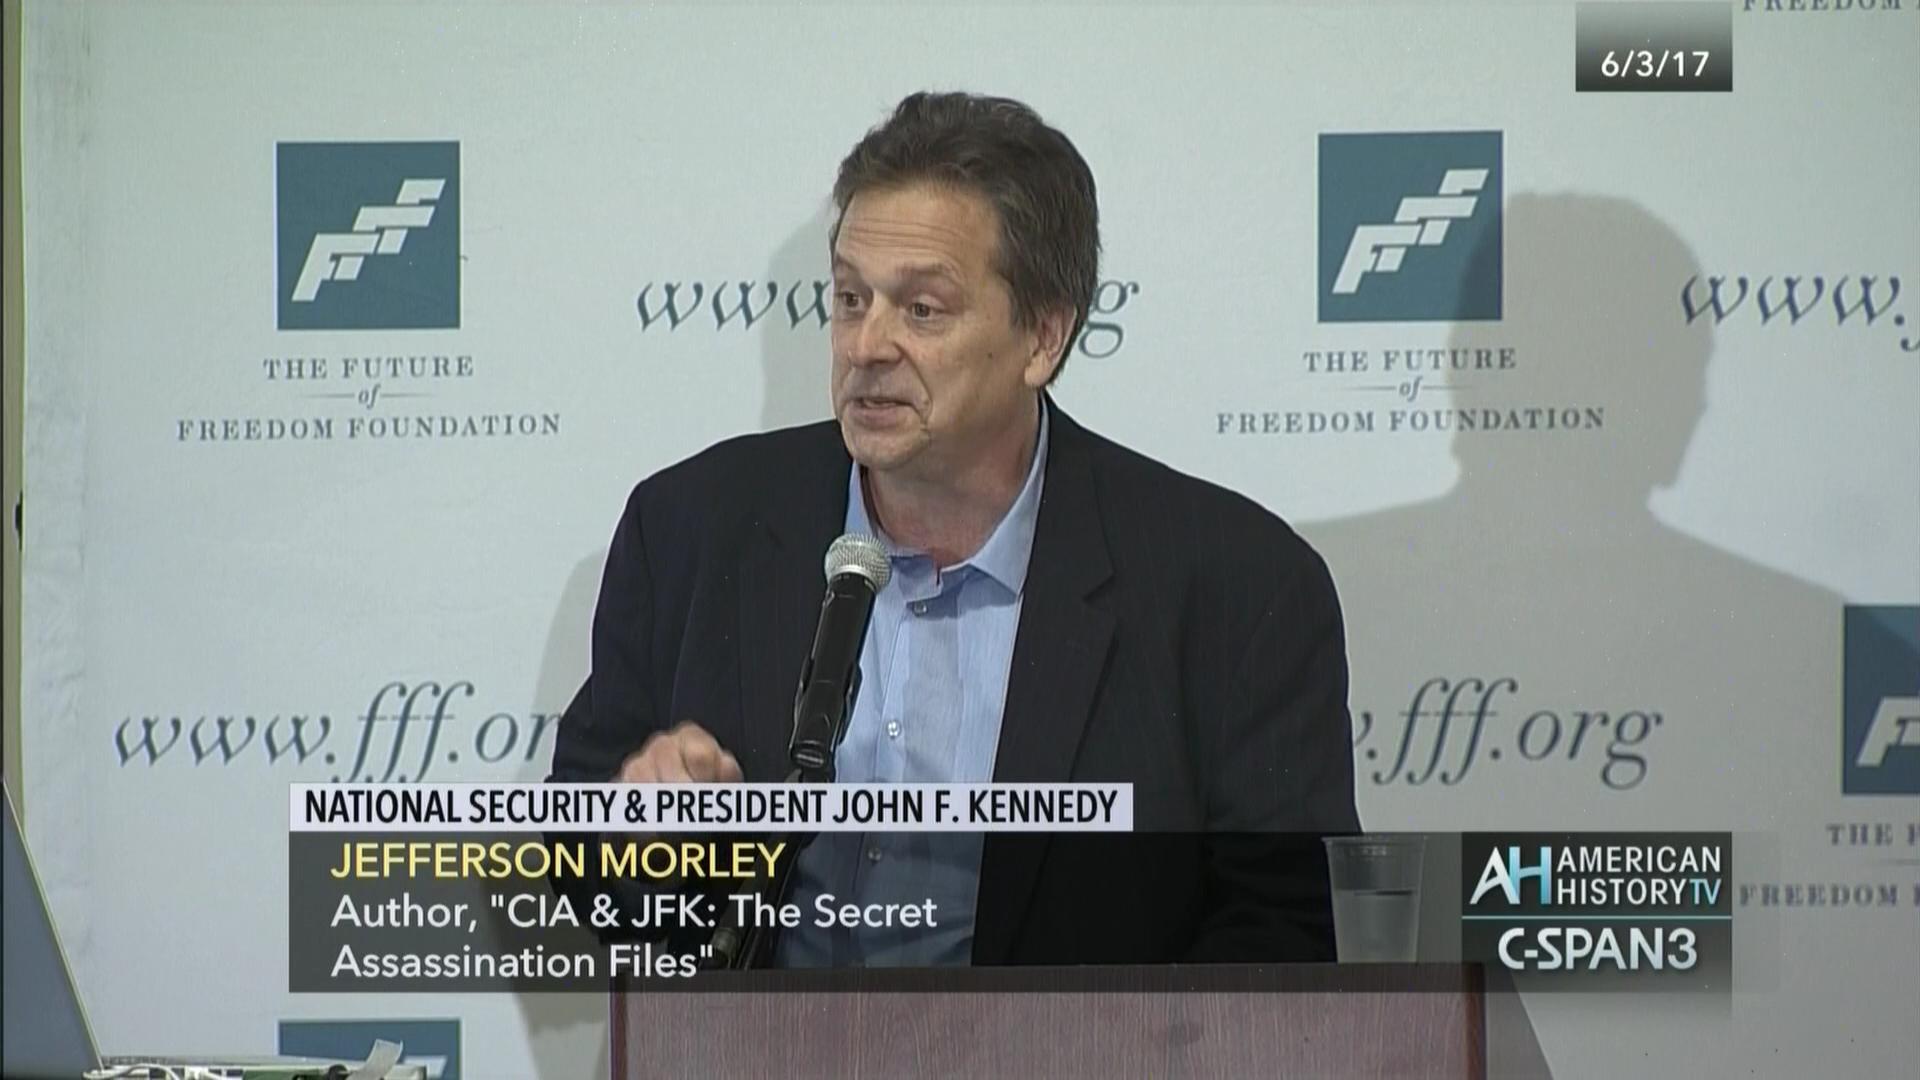 National Security President John F Kennedy Part 3, Jun 3 2017  Cspan